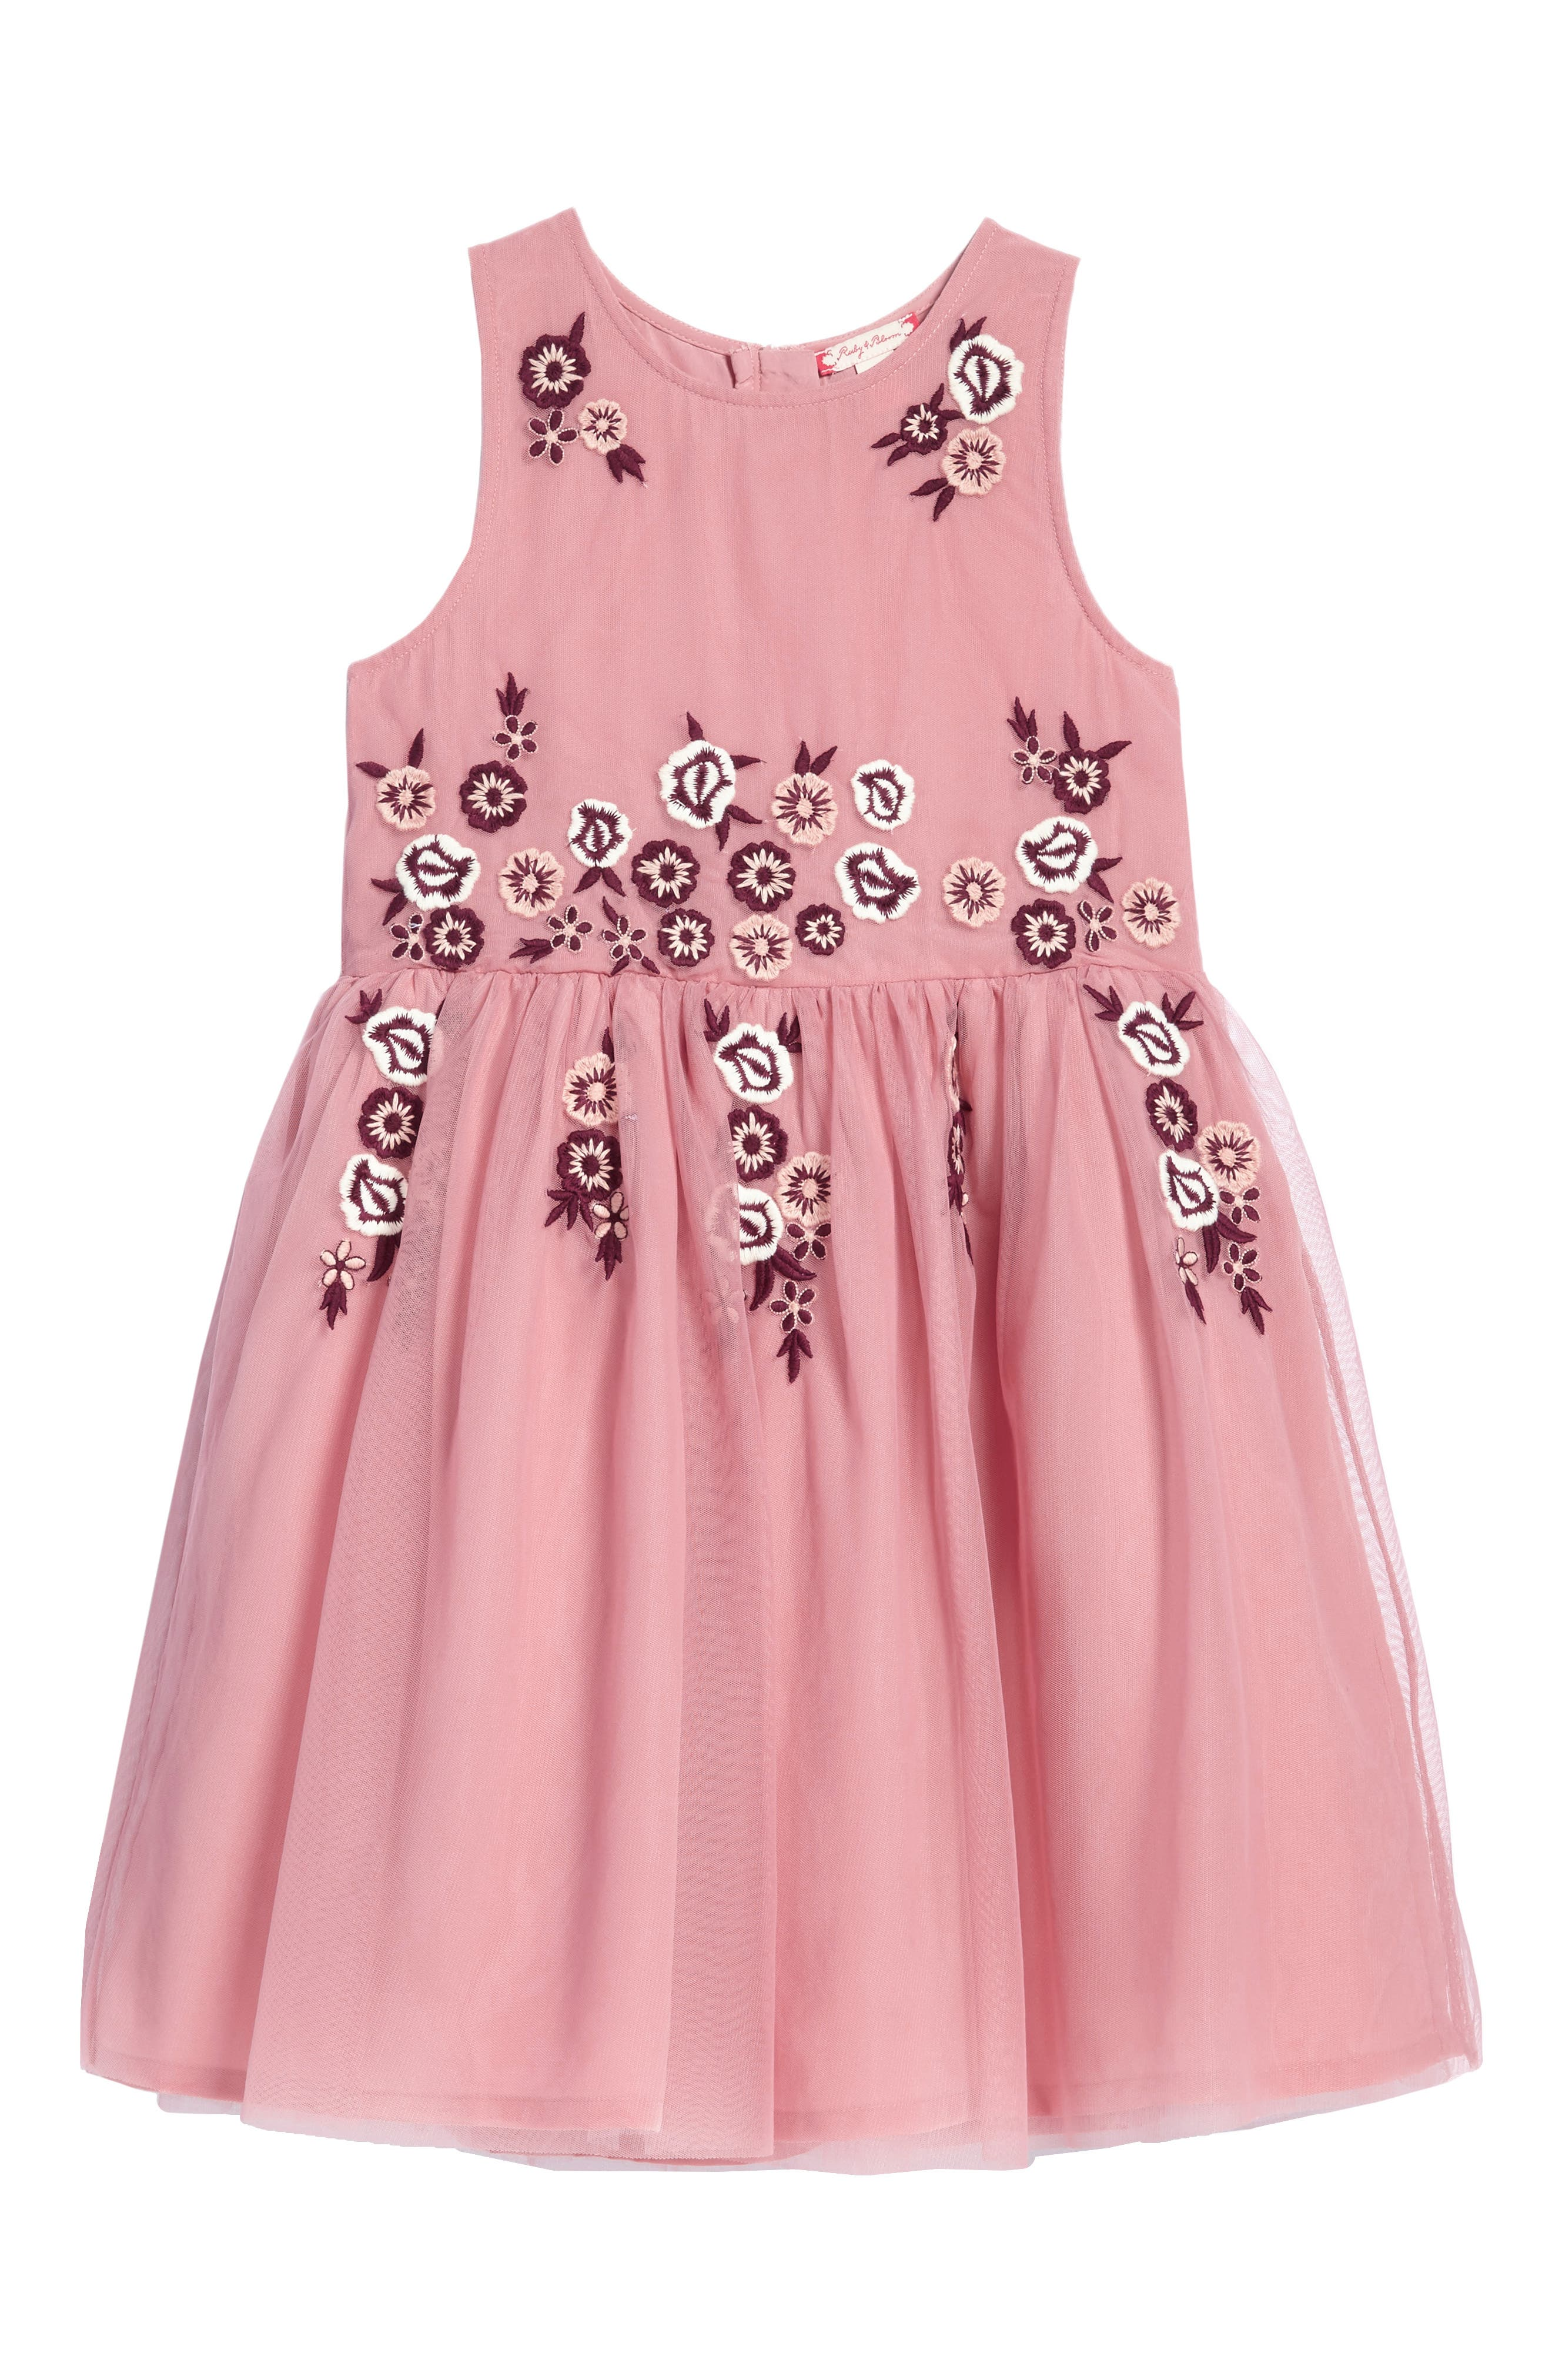 Ruby & Bloom Flower Embroidered Dress (Toddler Girls, Little Girls & Big Girls)